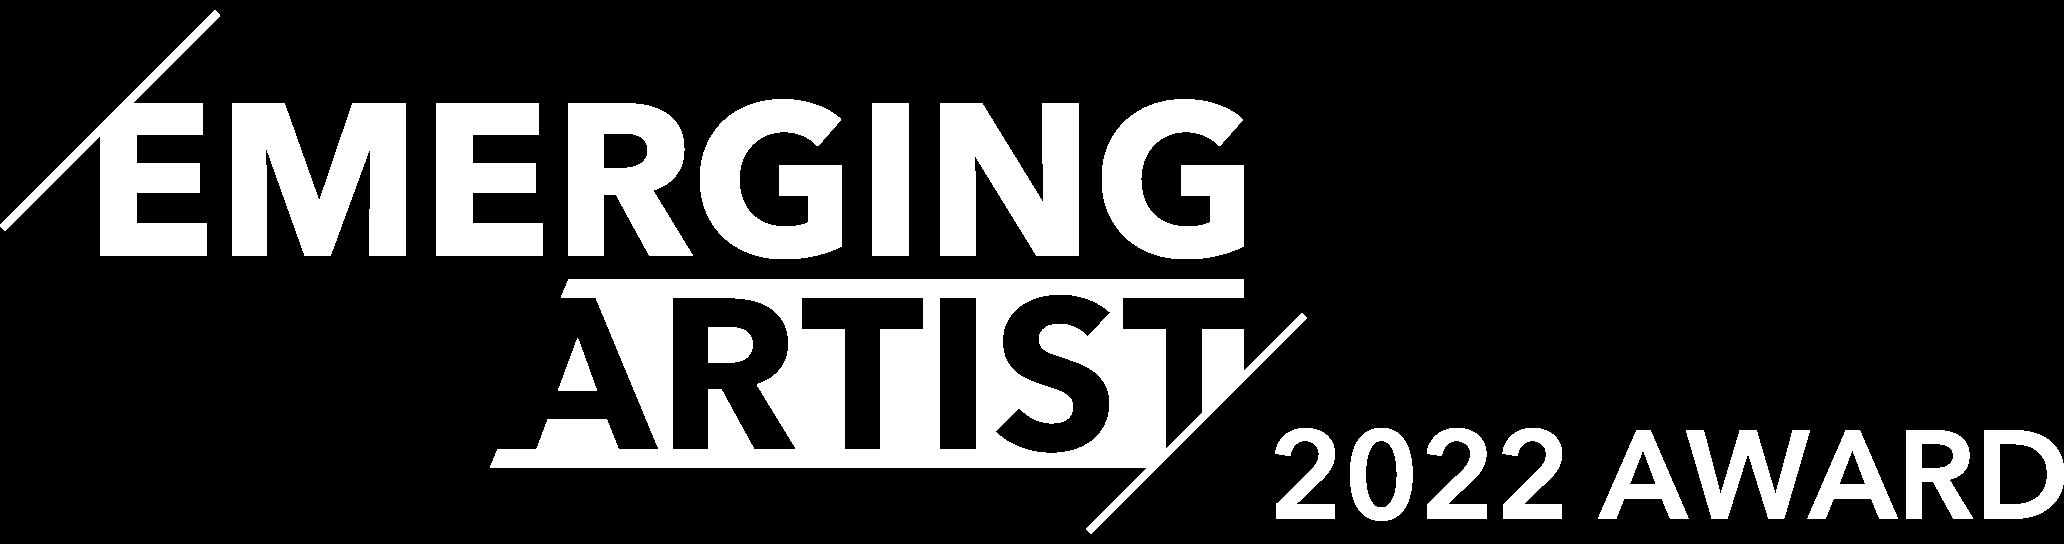 Emerging-Artist-2022-Award